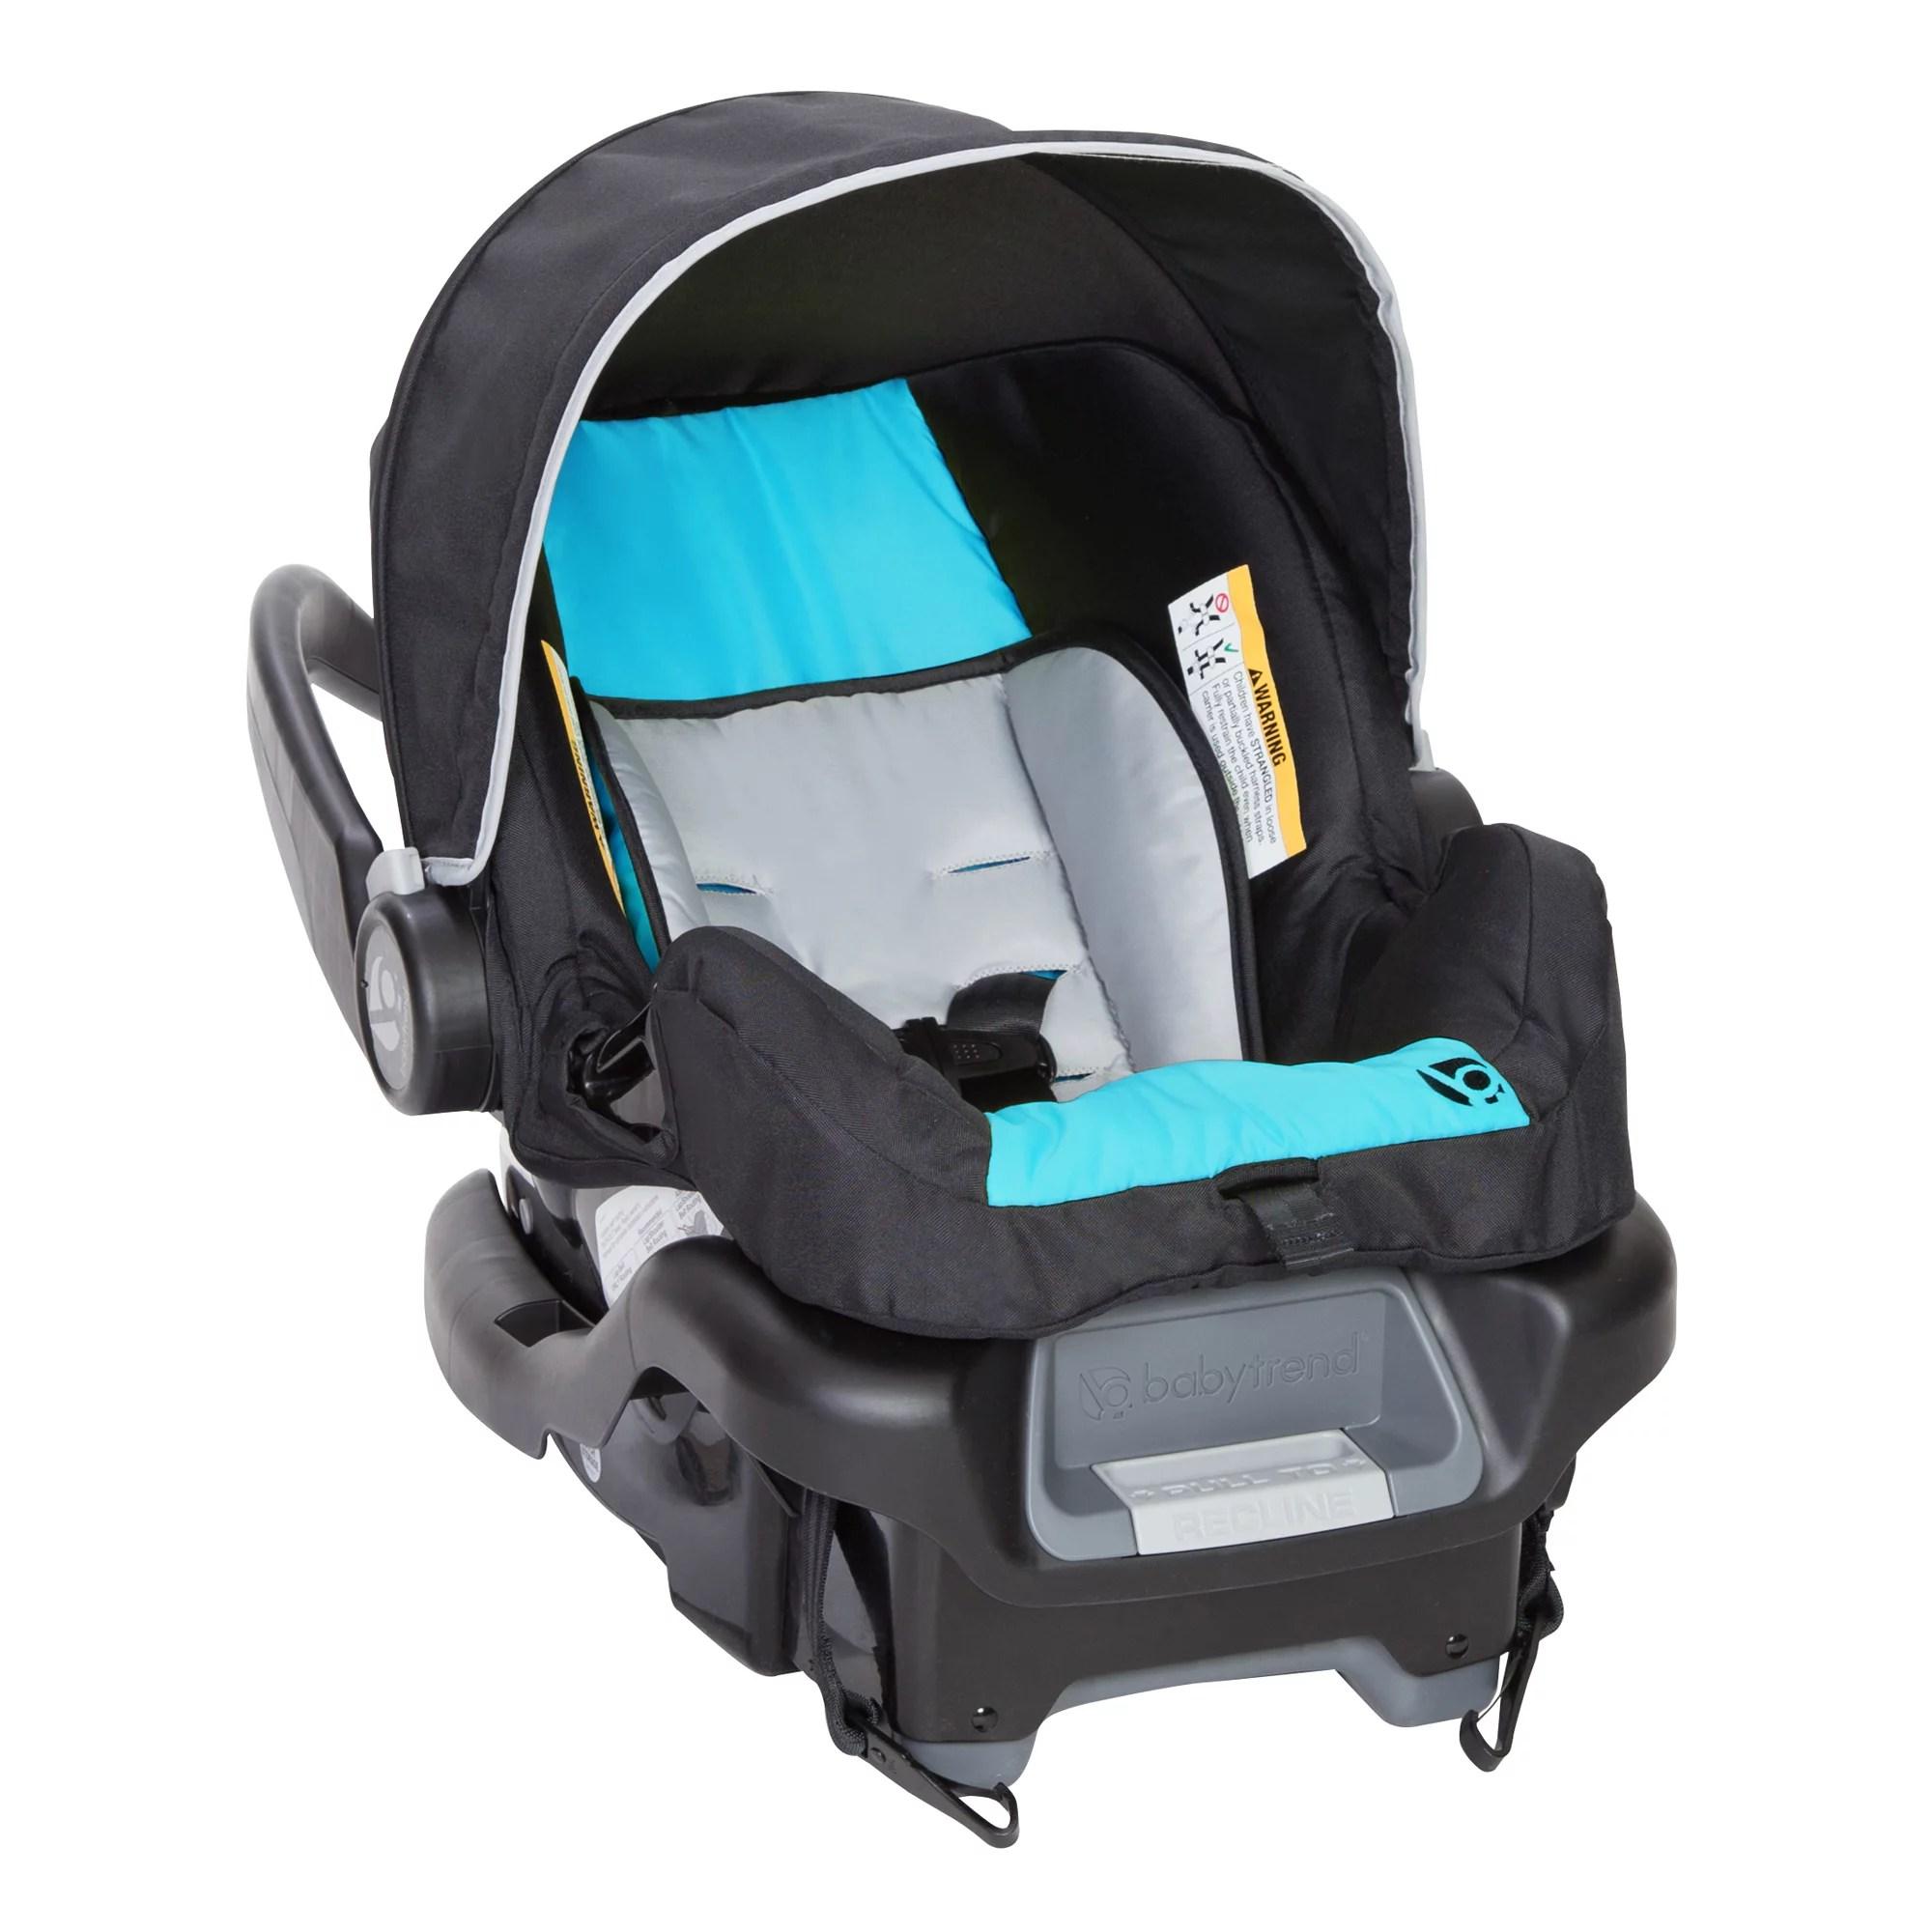 3 In 1 Baby Trend Stroller